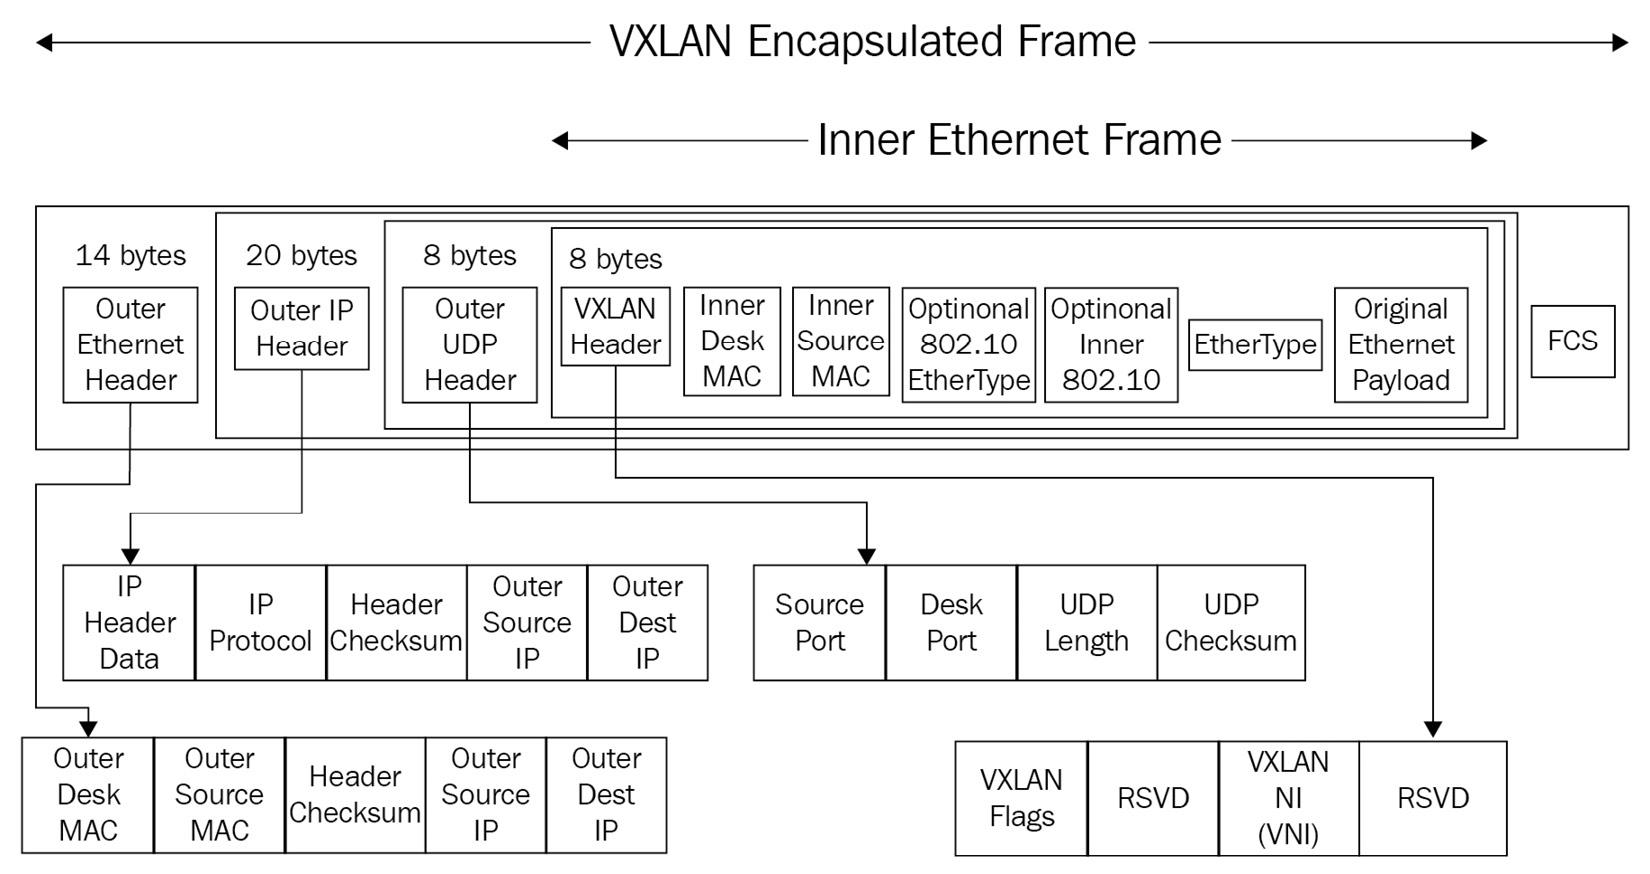 Figure 12.1 – VXLAN frame encapsulation